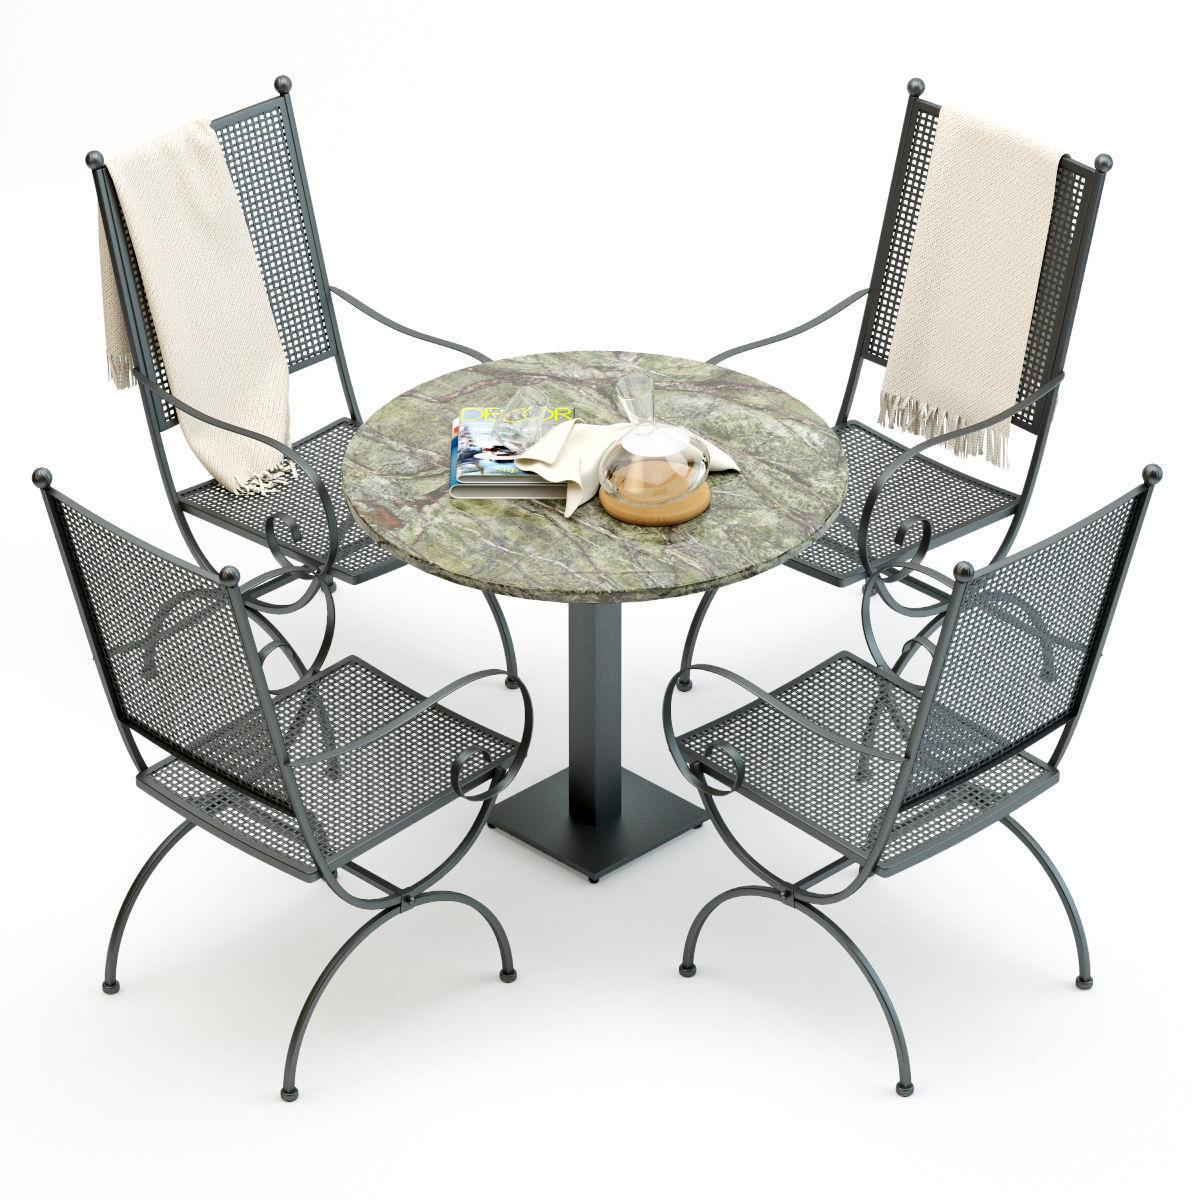 66e12502ea55d wrought iron chair and table set 3d model max obj mtl fbx 1 ...